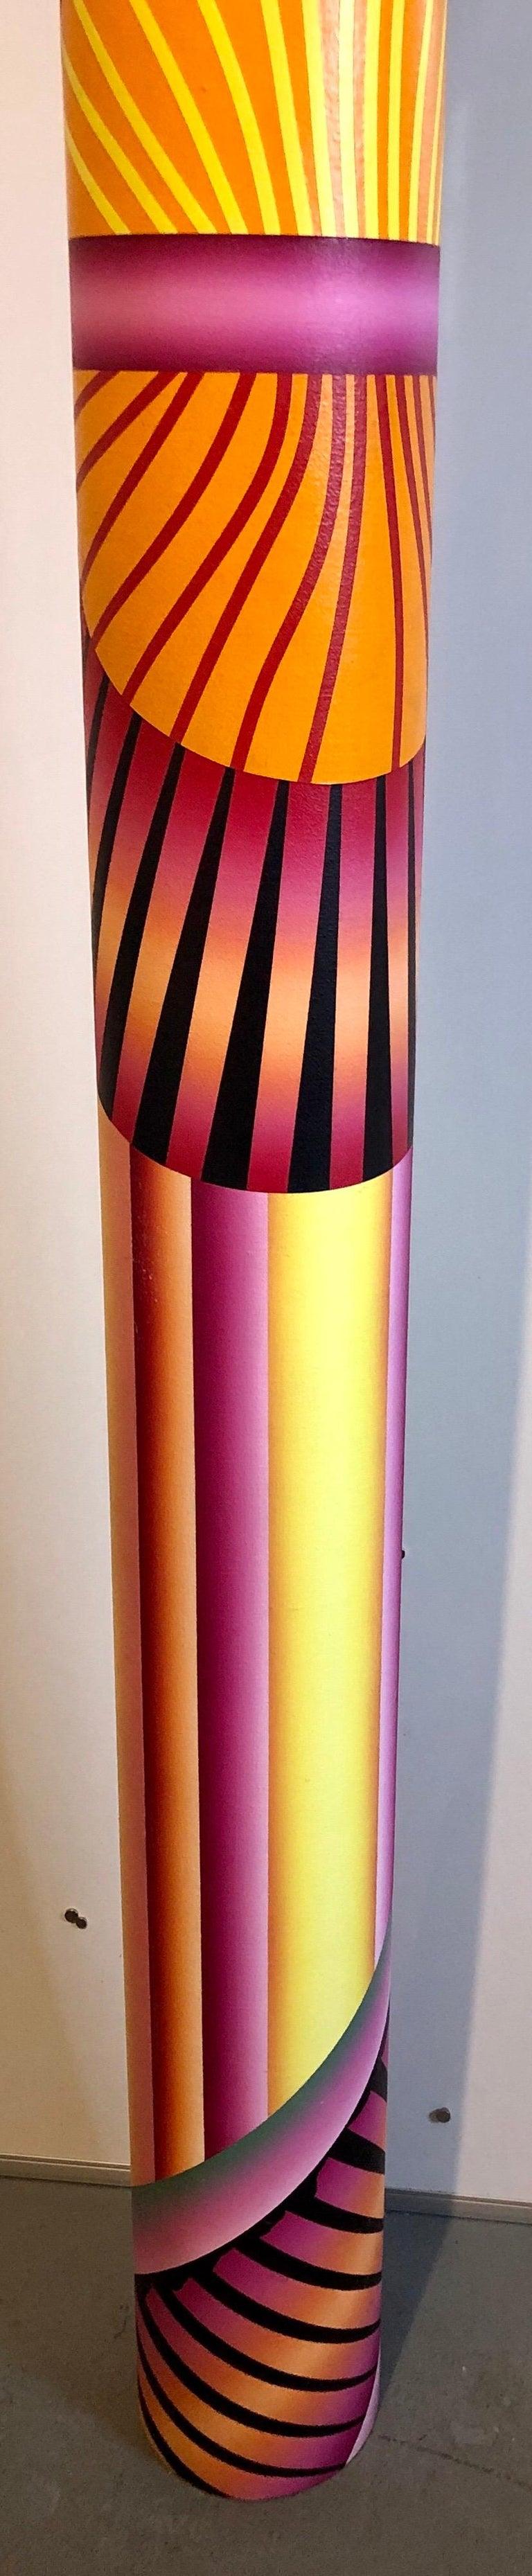 Abstract Geometric Shaped Canvas Painting Sculpture Memphis Milano Era 1980s Art 2